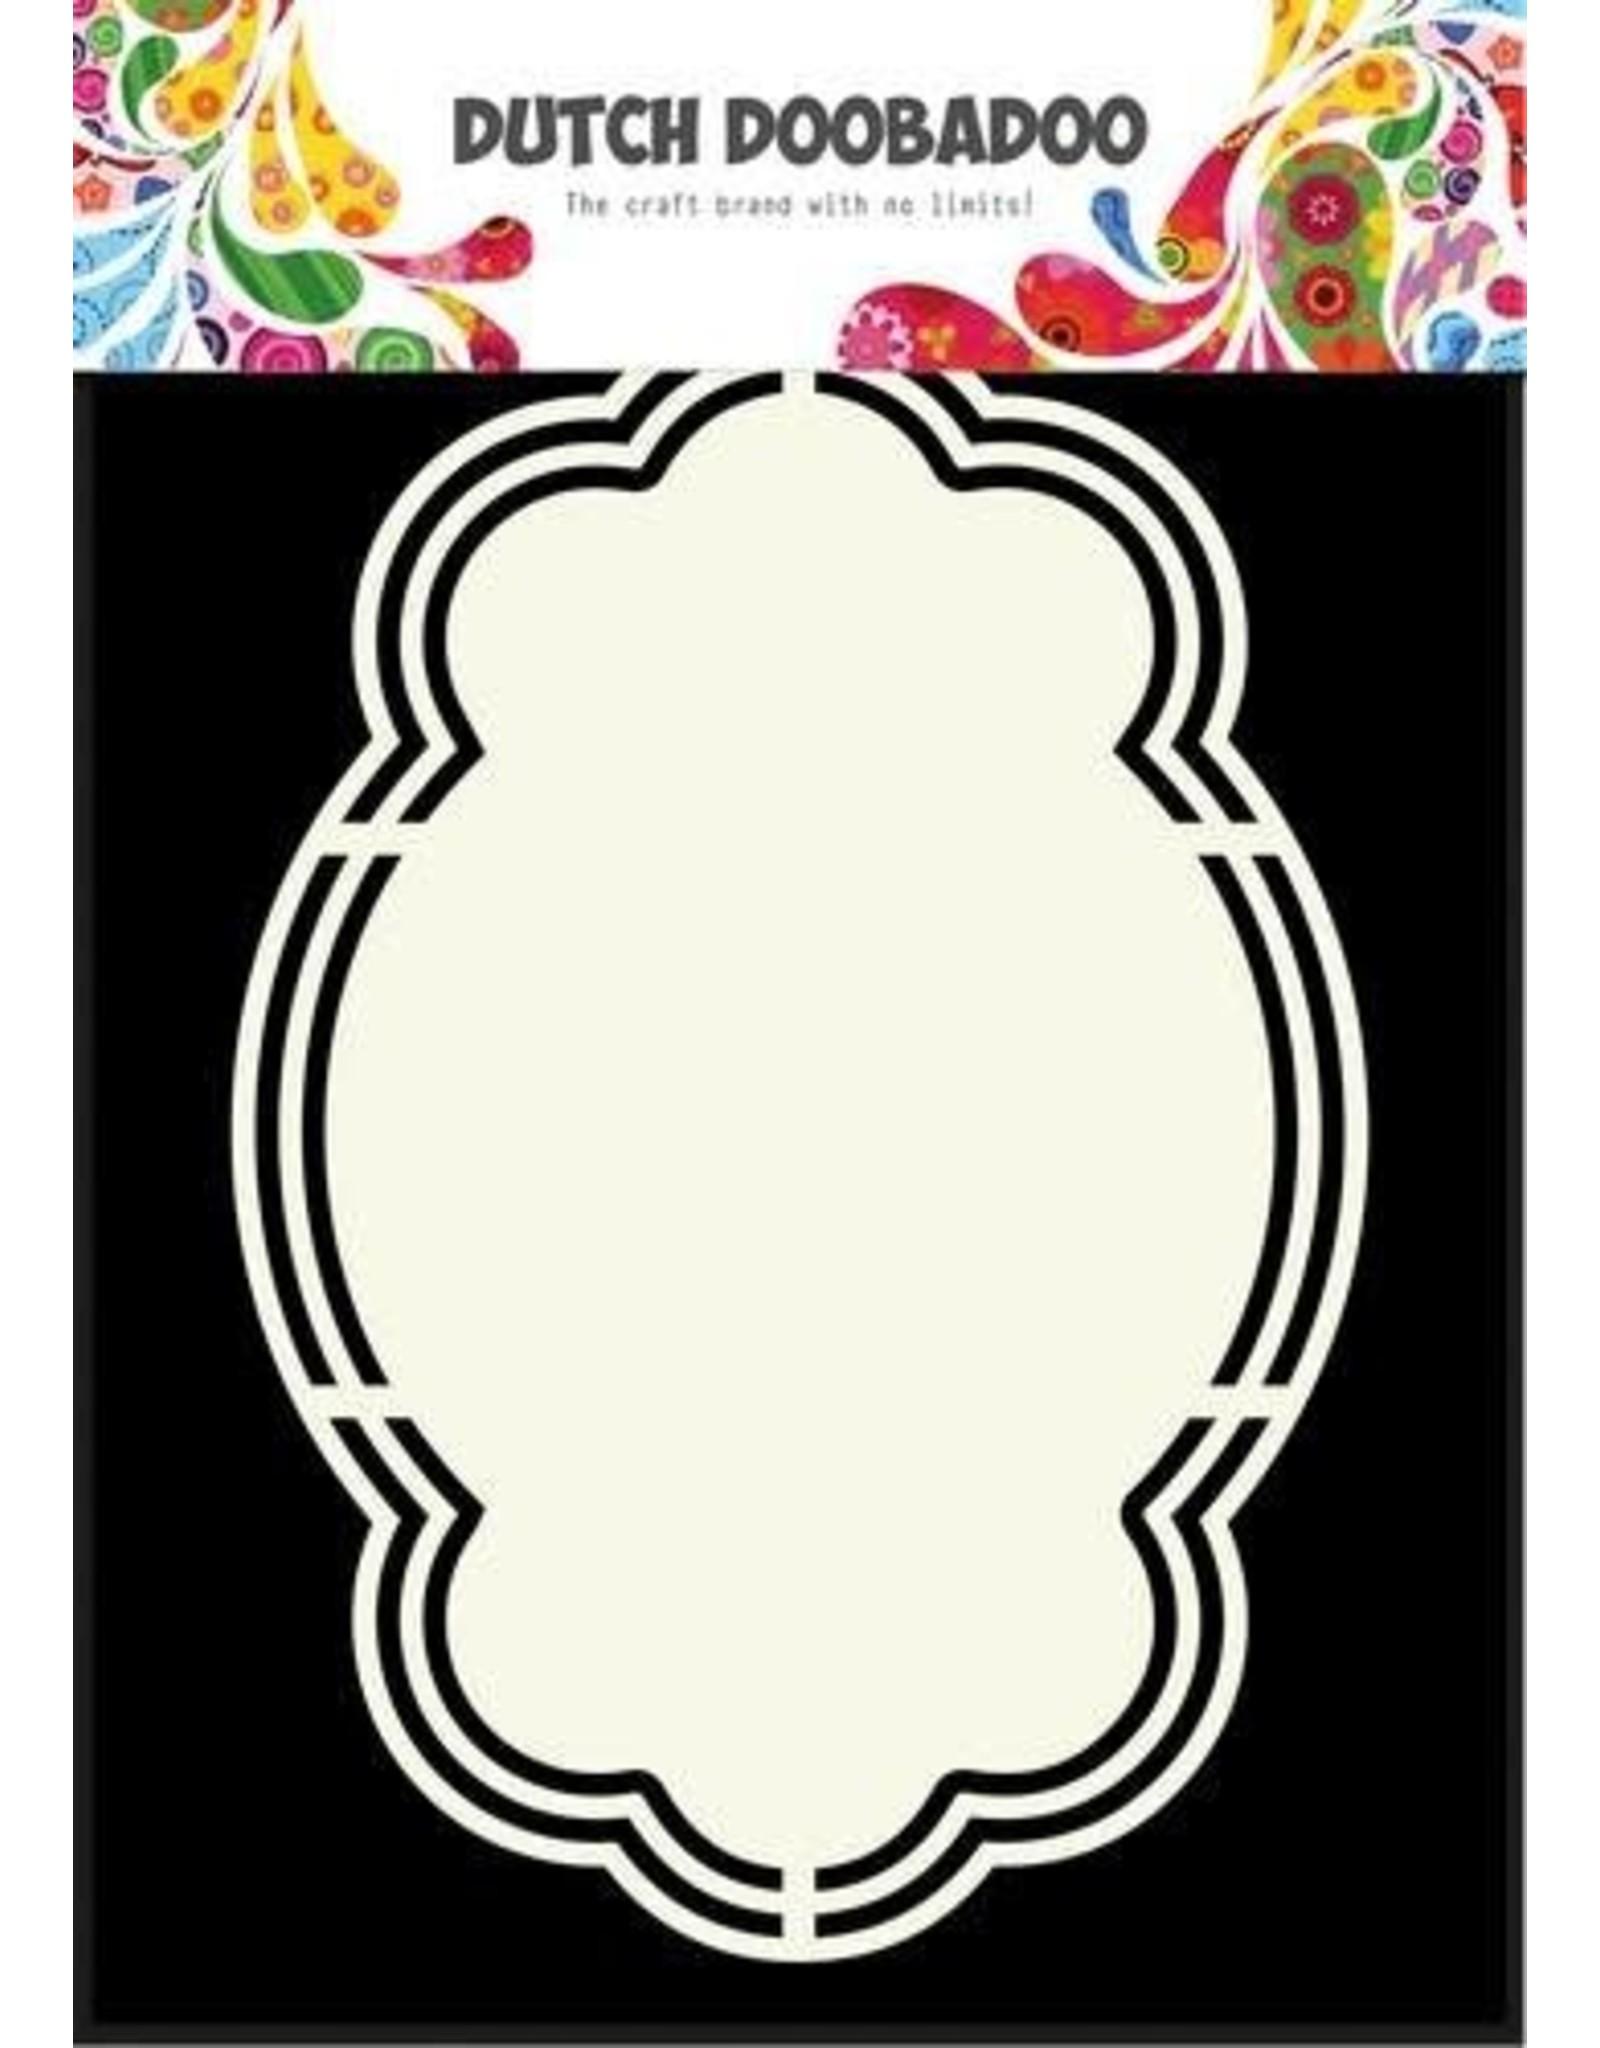 Dutch Doobadoo Shape Art Dutch Doobadoo Dutch Shape Art Cloud A5 470.713.147